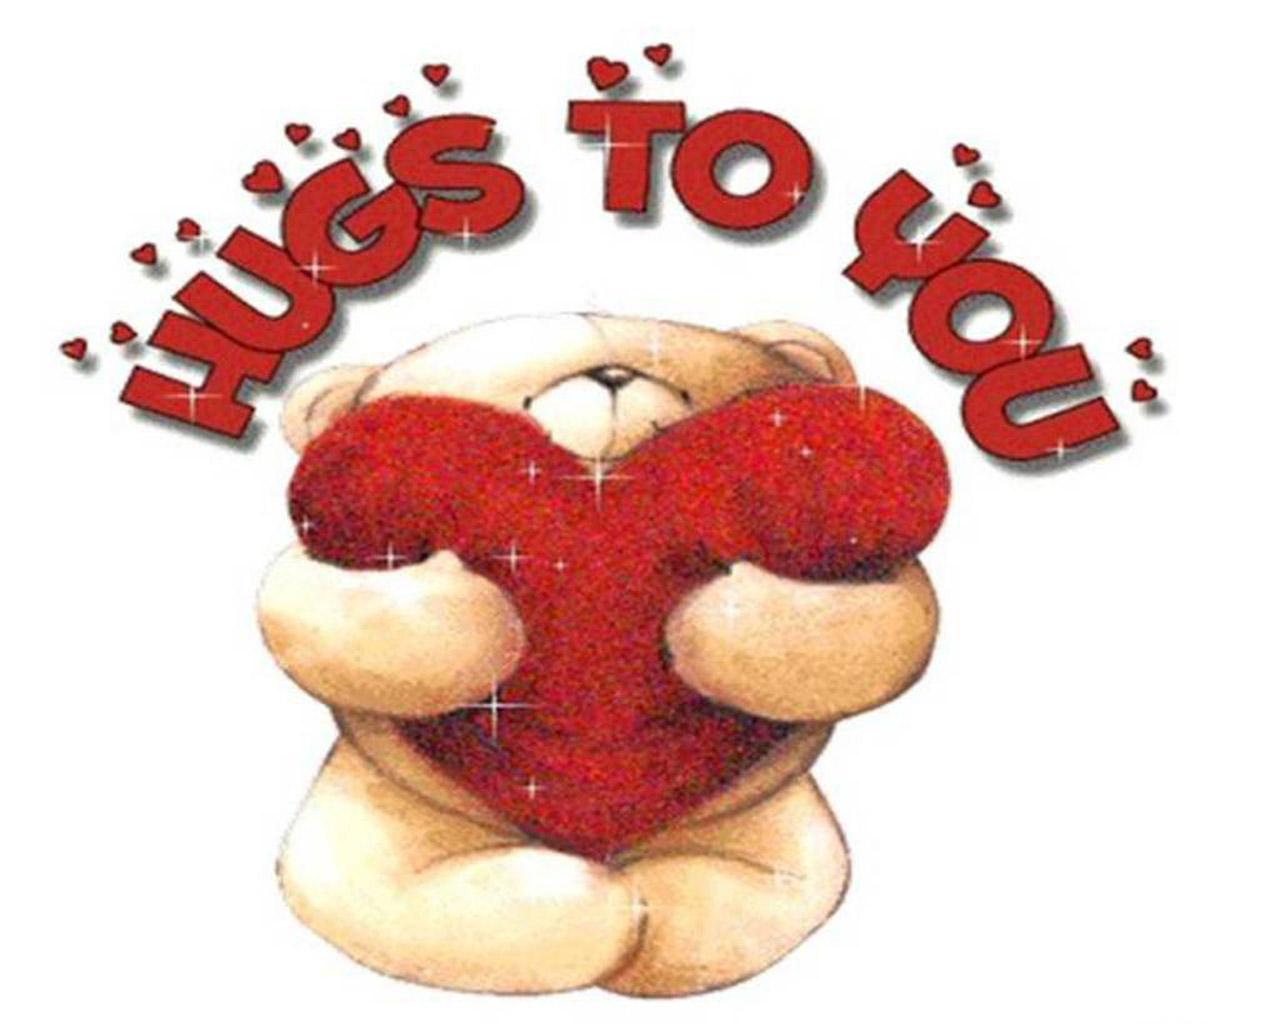 WallpaperfreekS: Happy Hug Day (12th Feb)